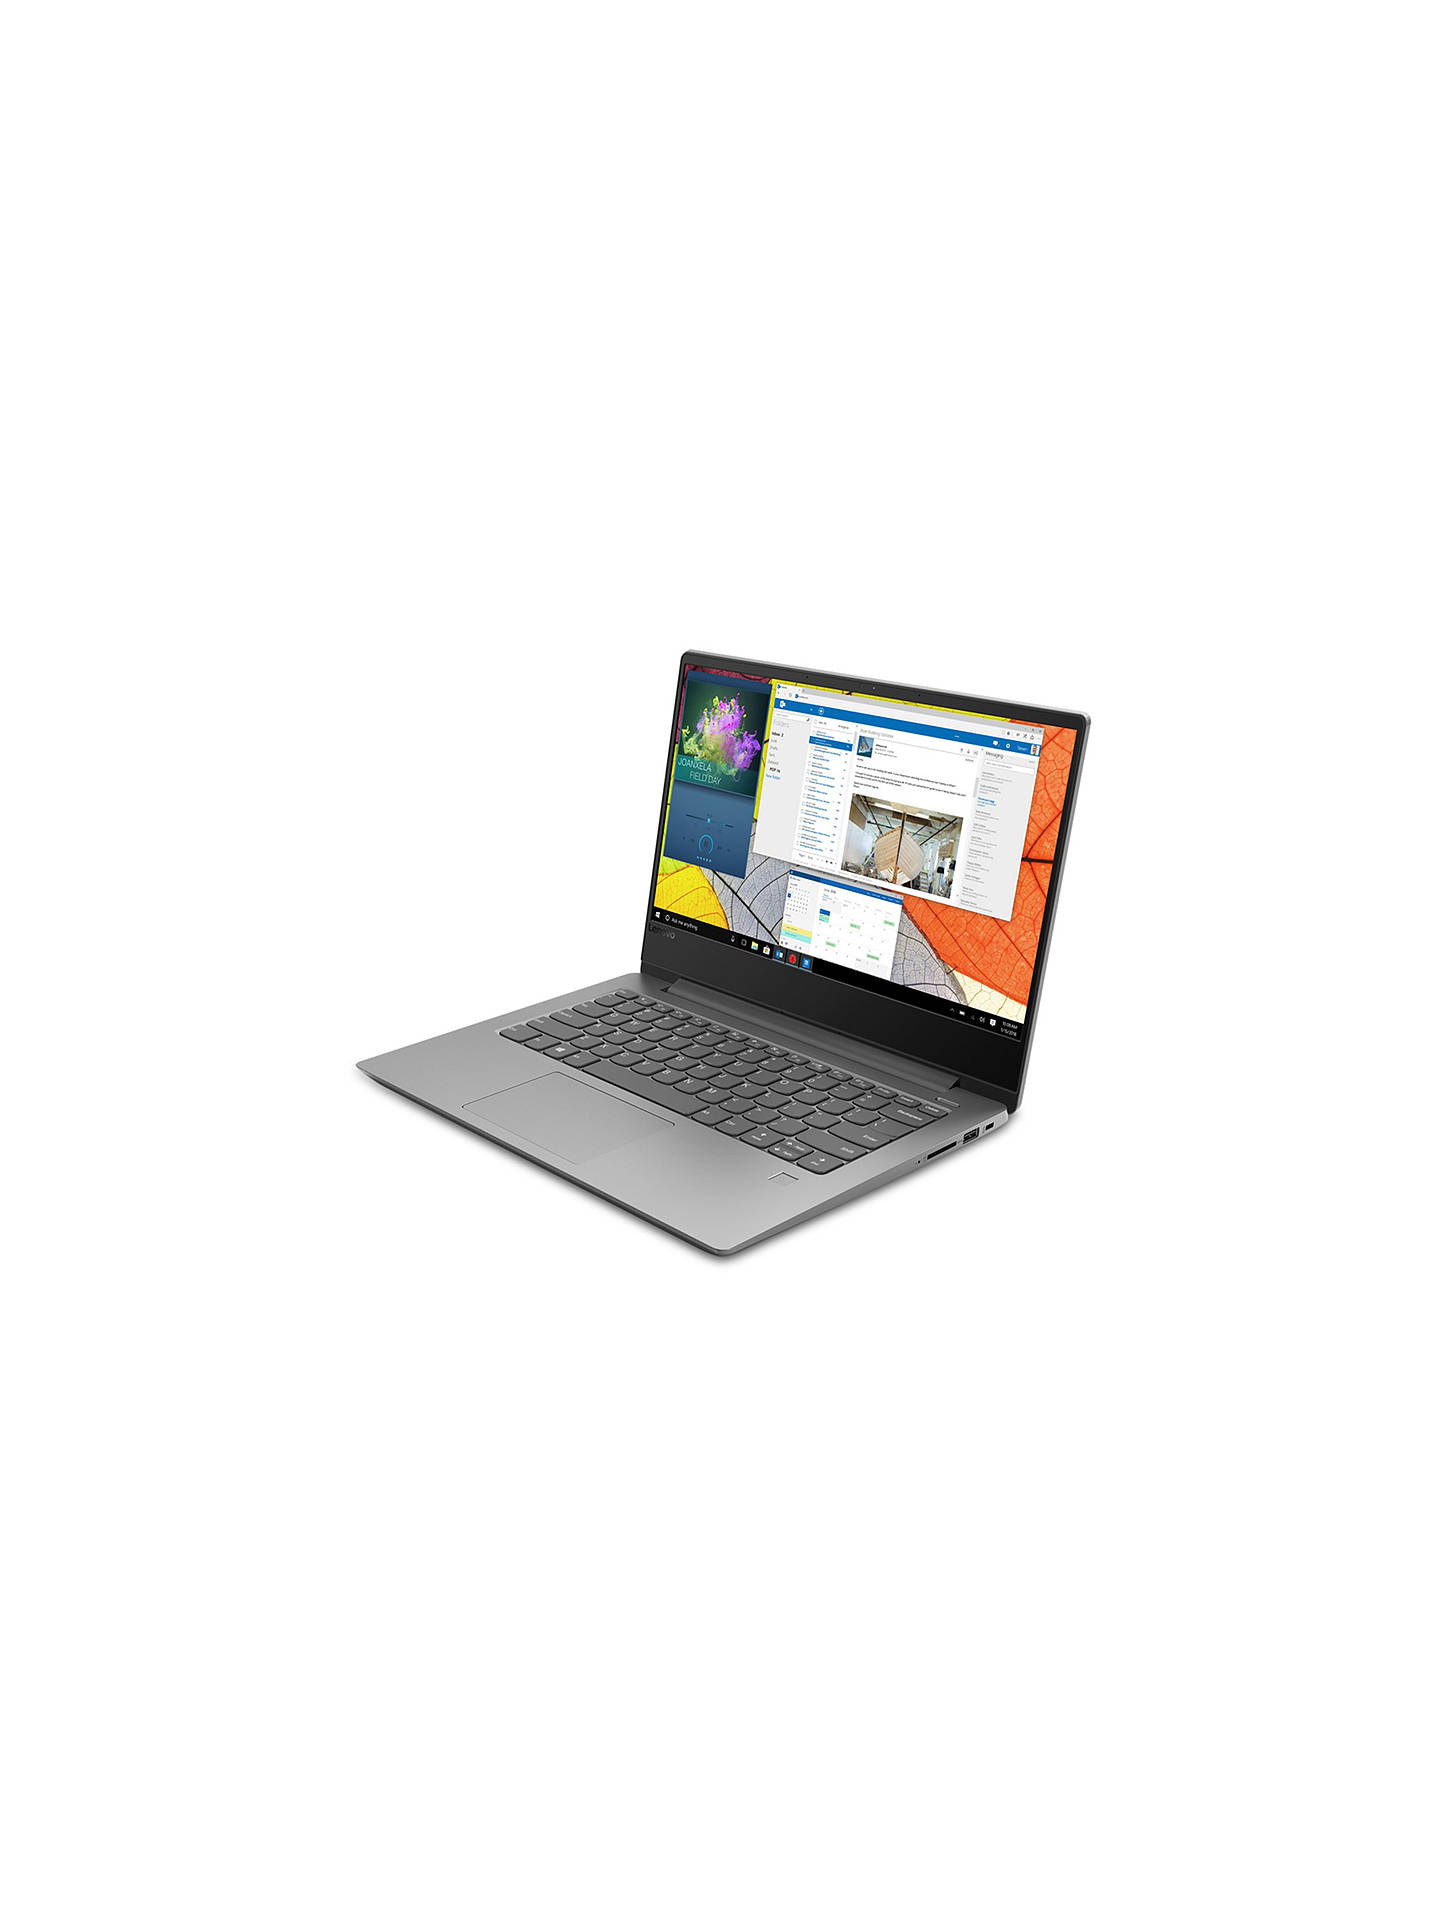 "Lenovo IdeaPad 330S Laptop, Intel Core i5, 8GB RAM, 1TB HDD + 16GB Intel  Optane, 14"" Full HD, Grey"